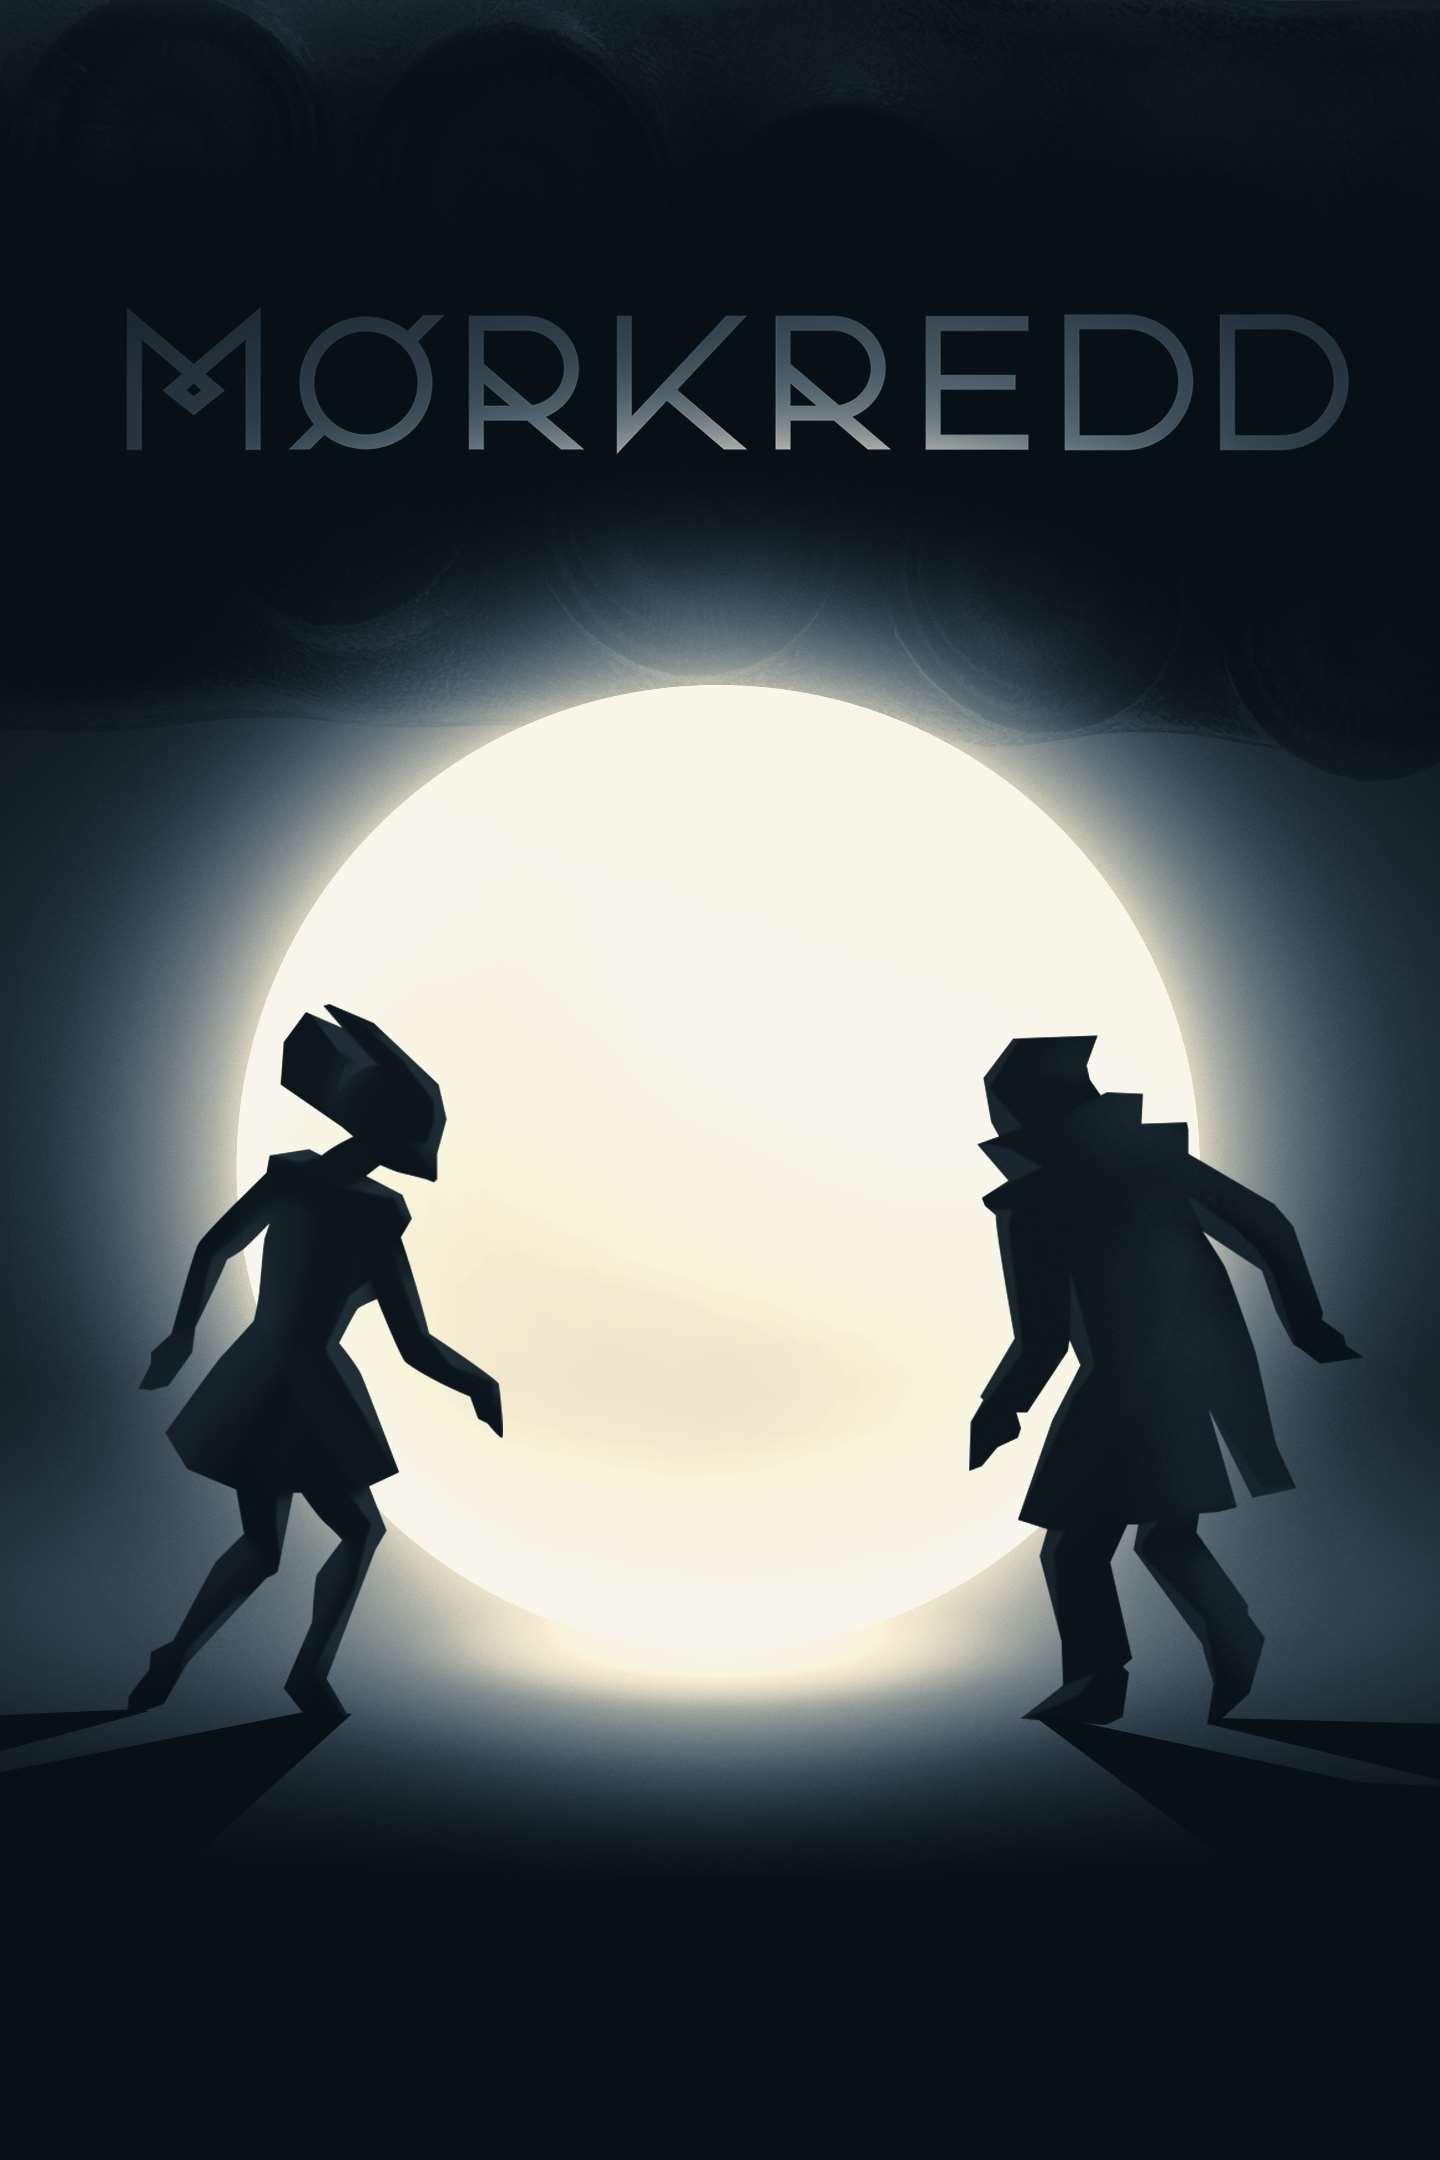 Find the best gaming PC for Morkredd